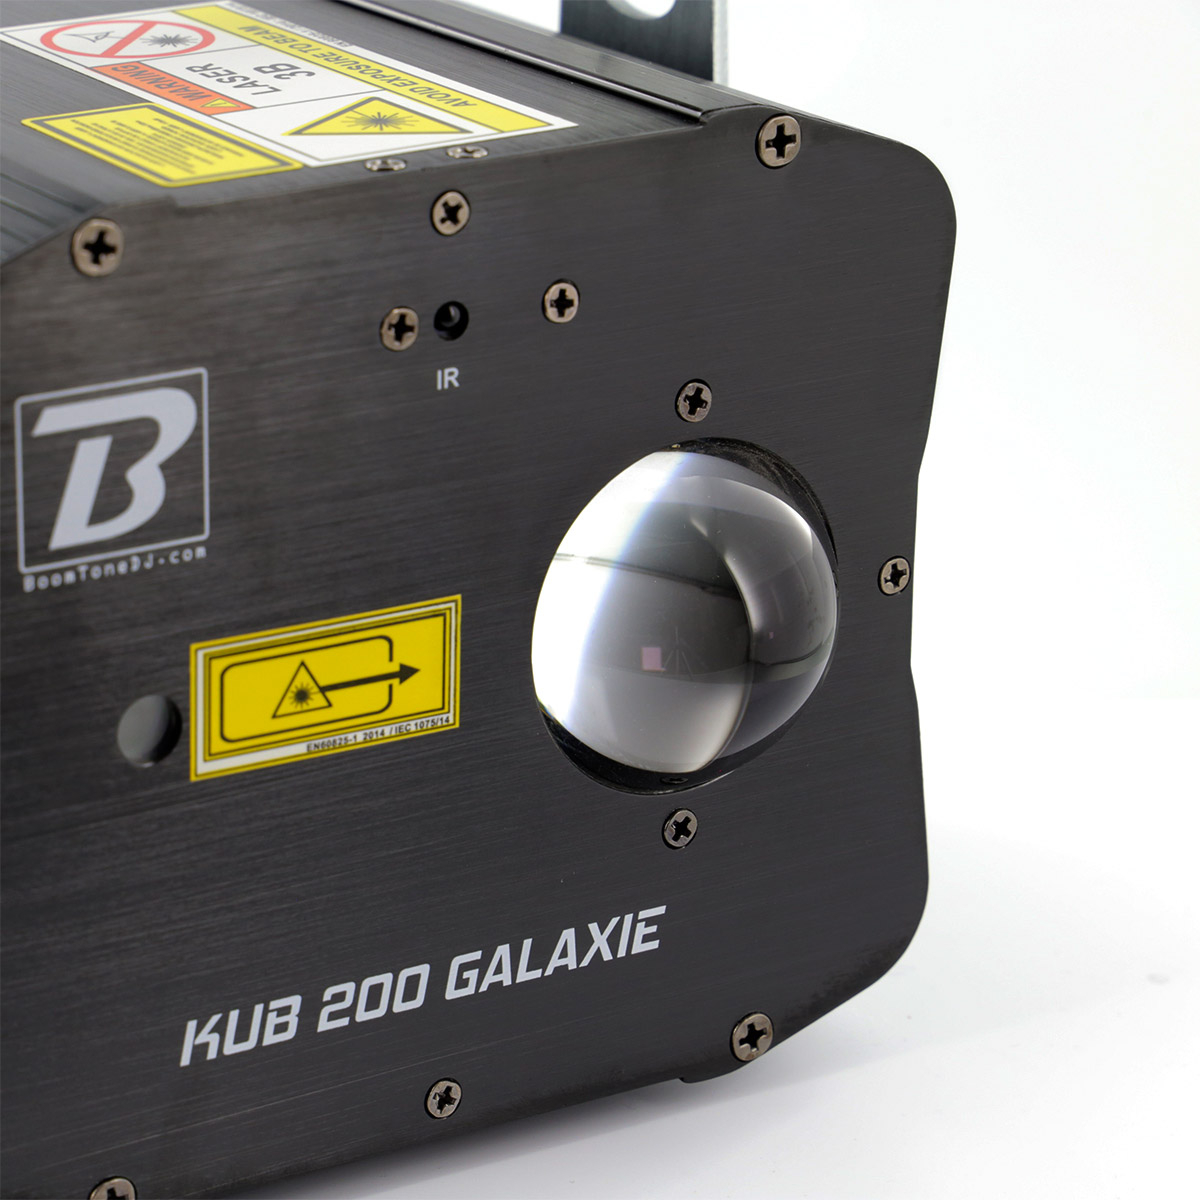 KUB 200 Galaxie